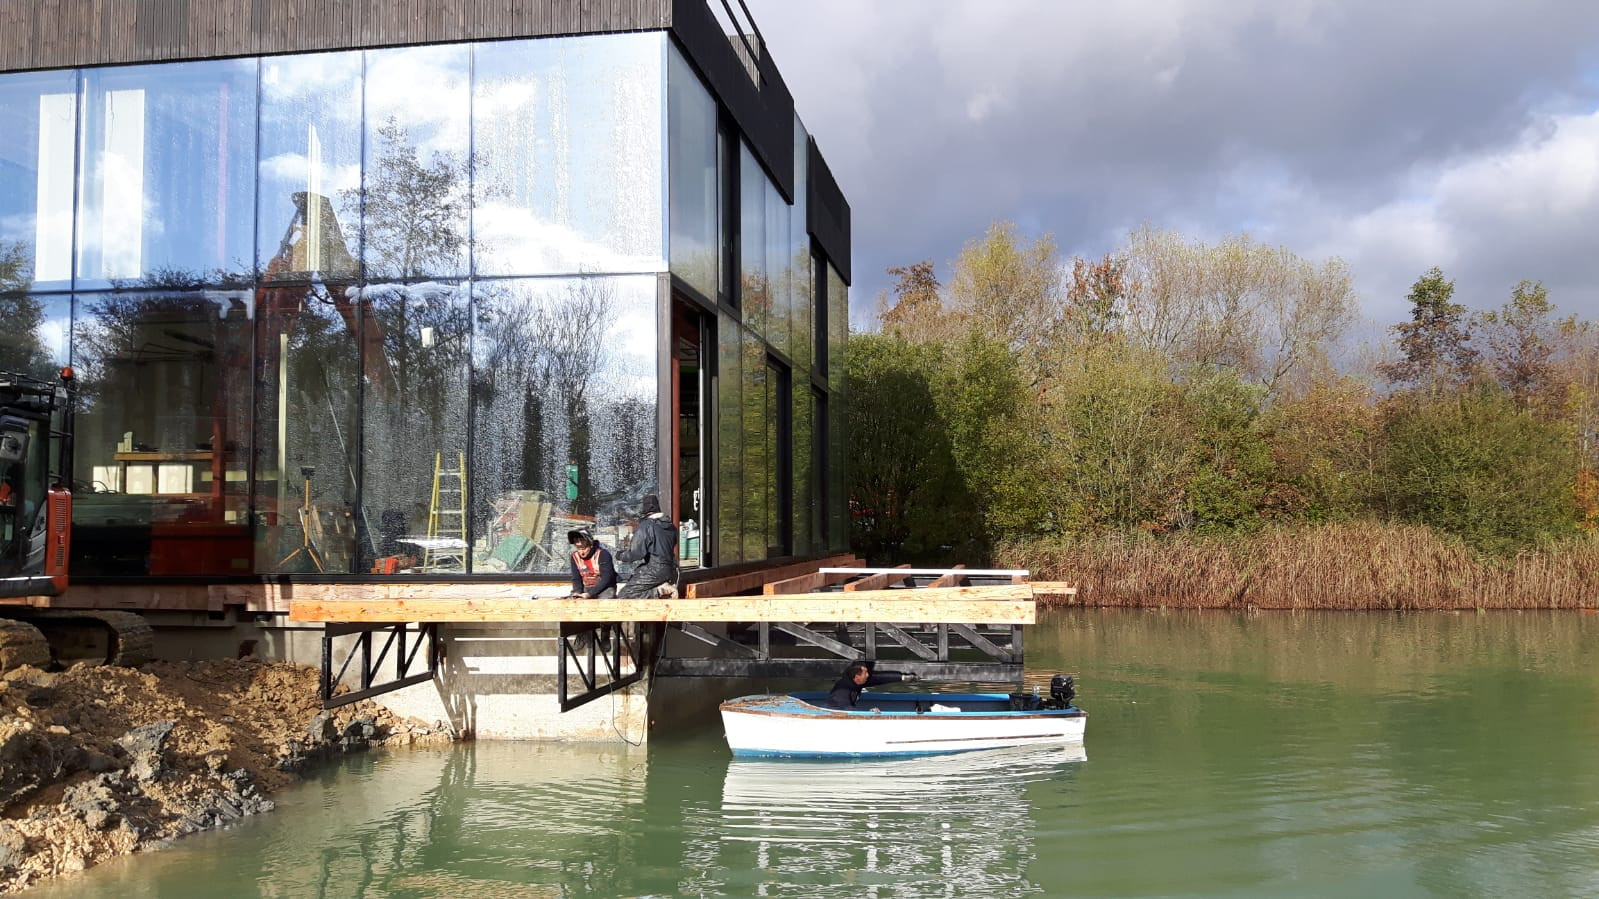 Iruko Berri - The lakes 2